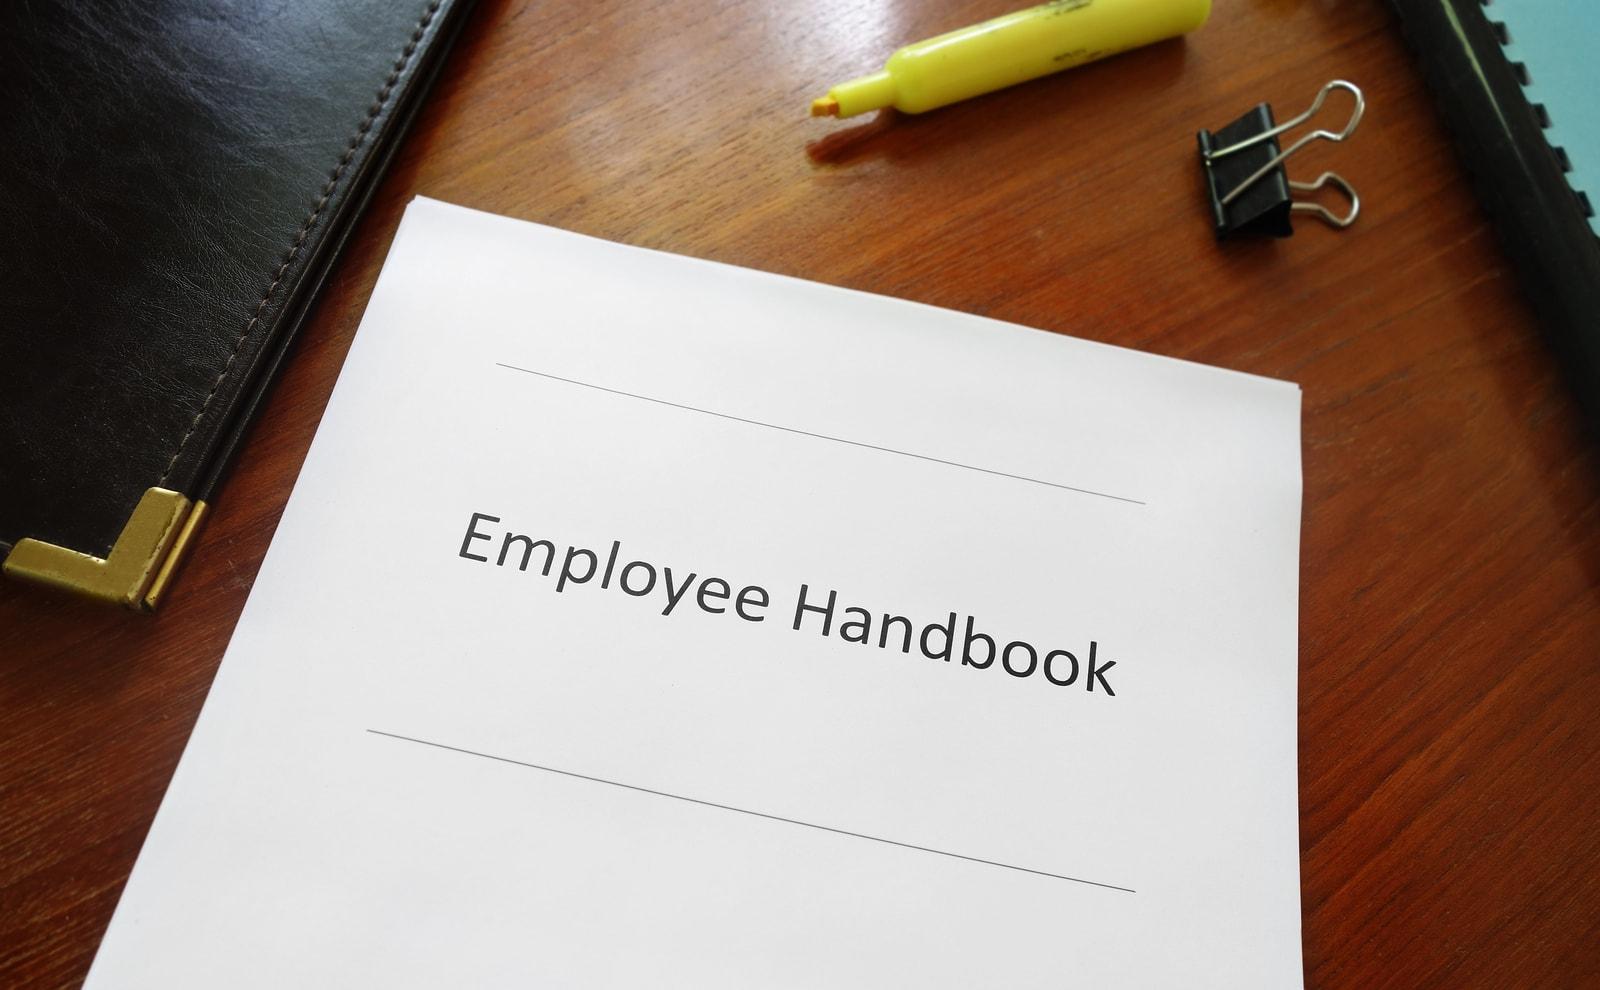 Make-Your-Employee-Handbook-More-Effective.jpg